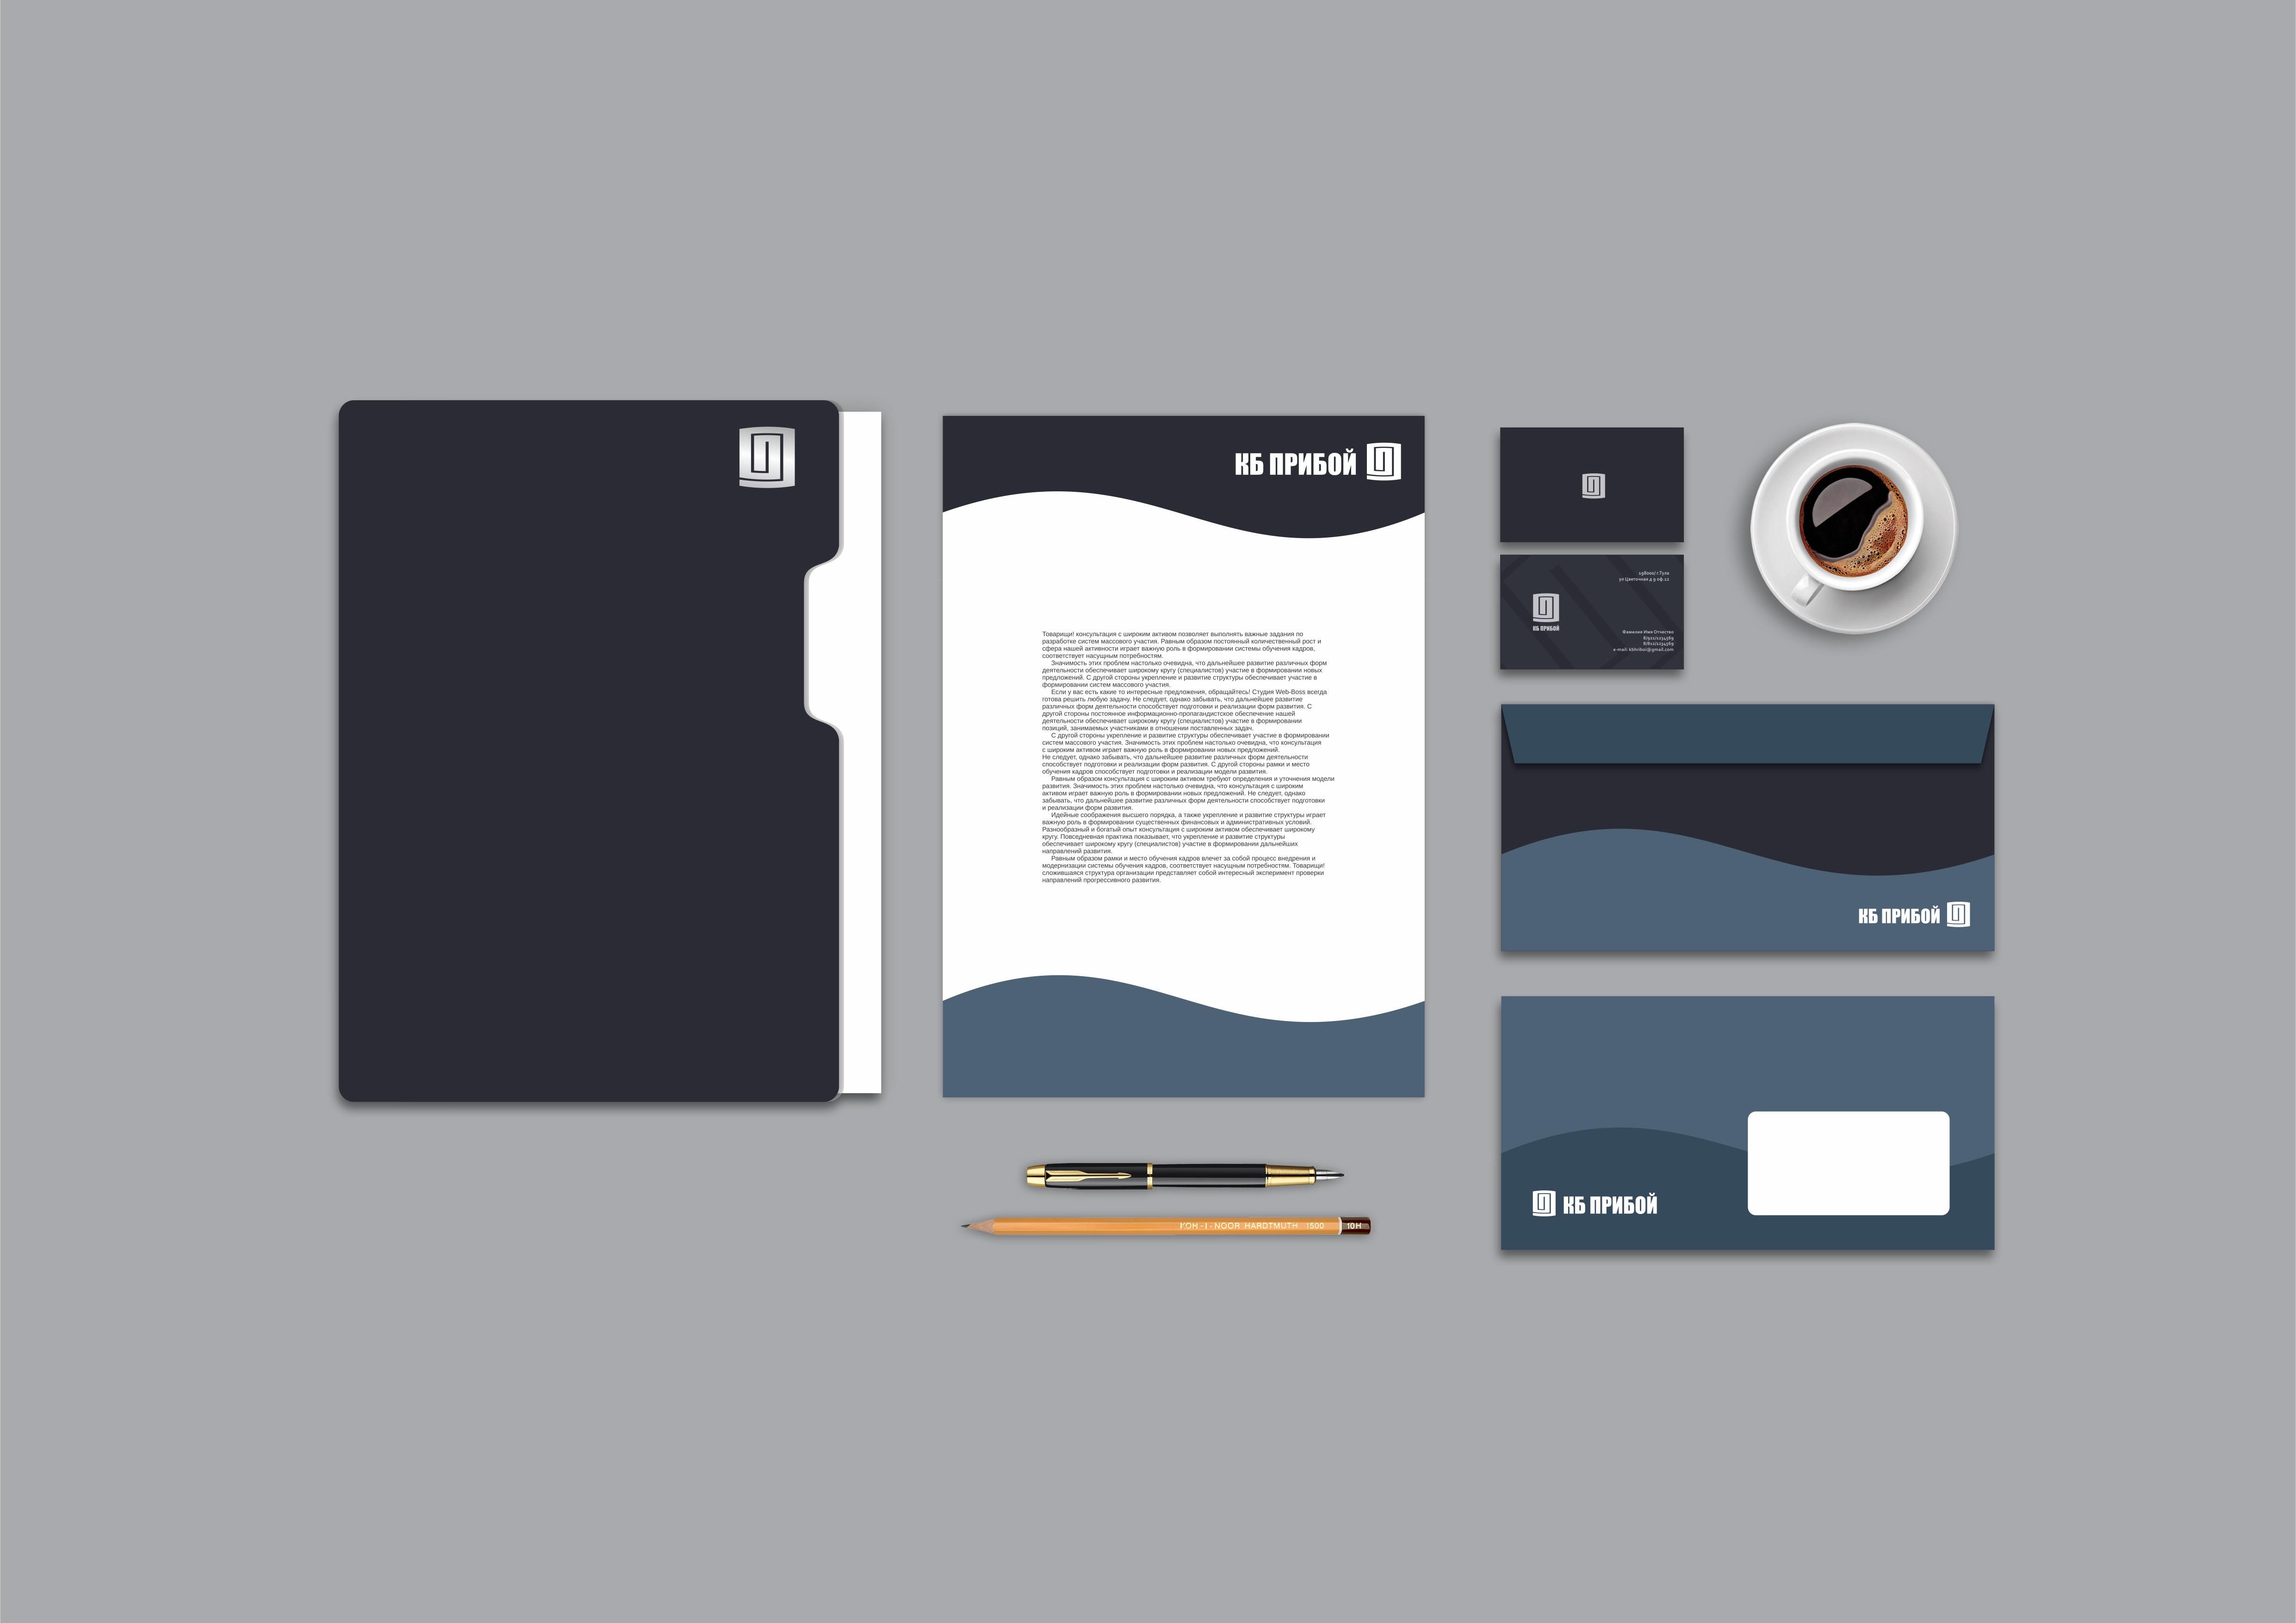 Разработка логотипа и фирменного стиля для КБ Прибой фото f_2815b2a1ec5ebd8d.jpg